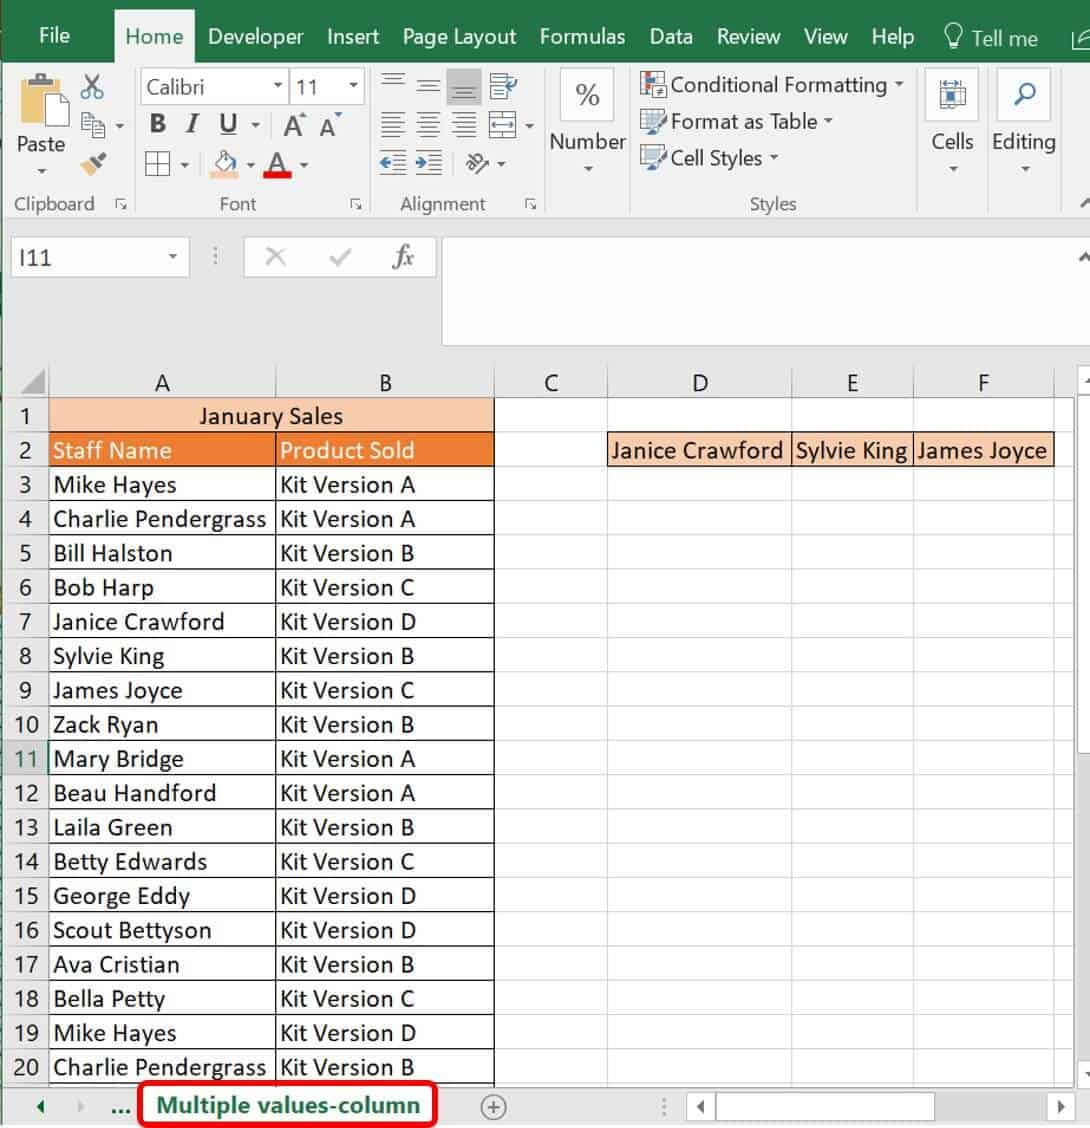 Cricbuzz ipl 2019 live score mi vs csk final